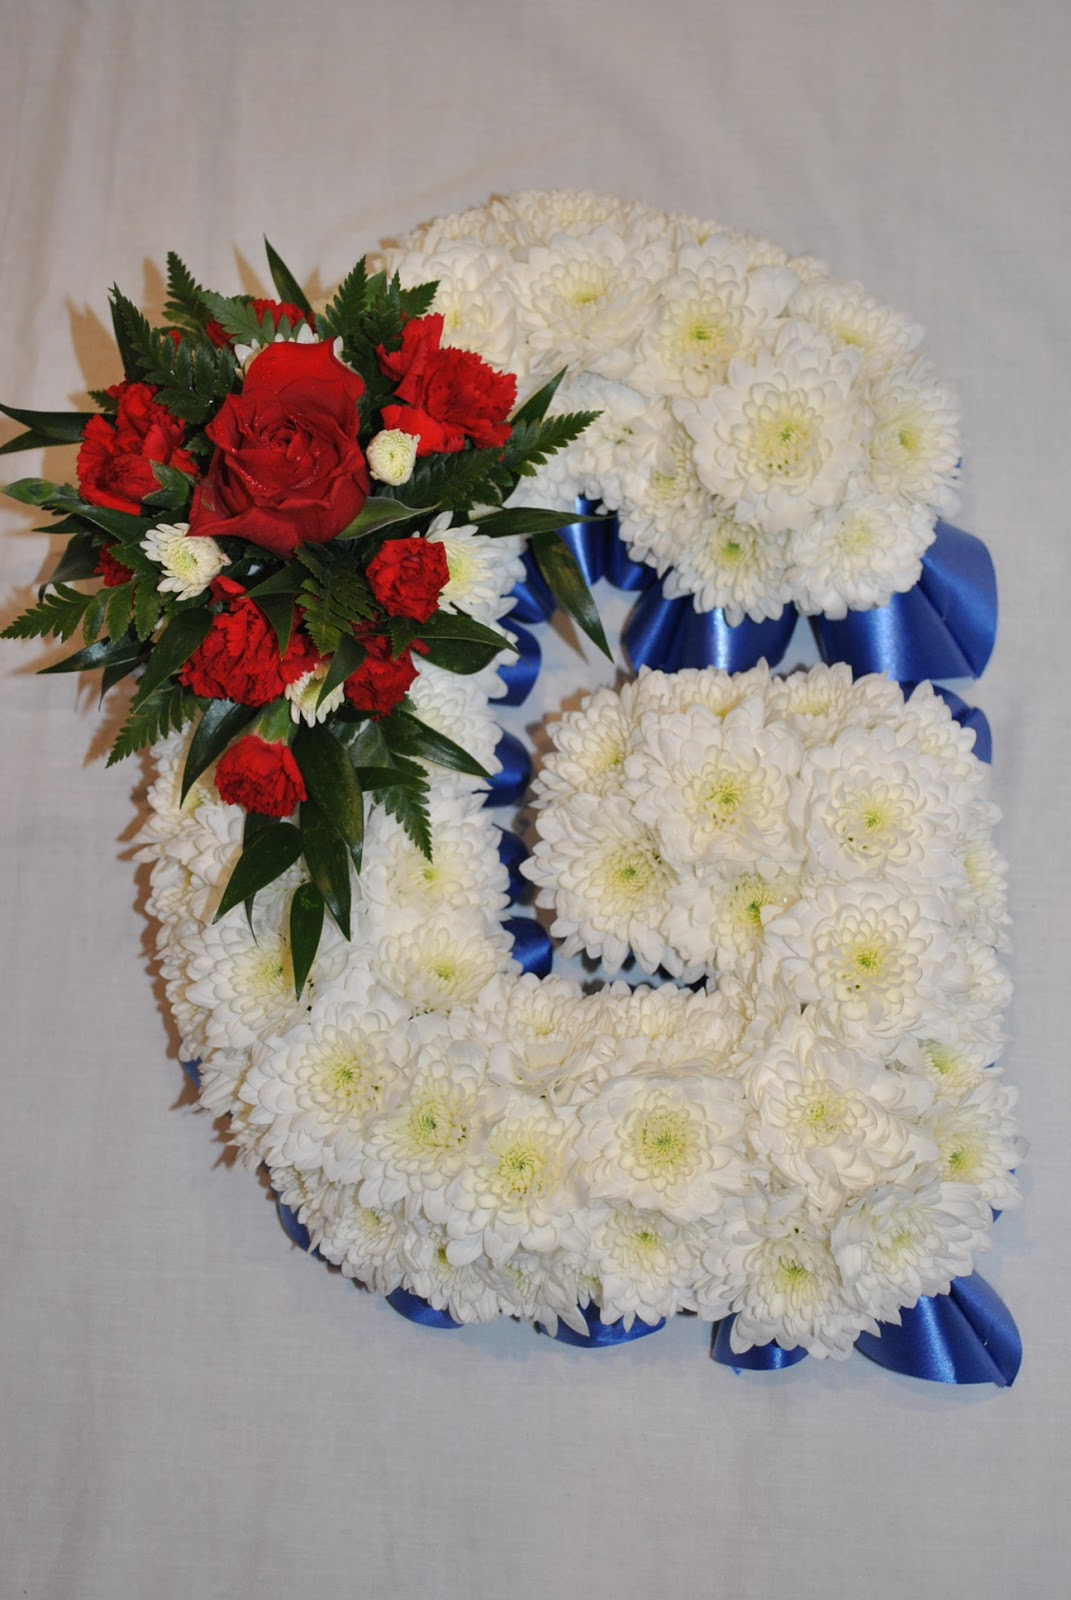 Lucys flower studio letter g for graham pressler grahams funeral flowers in the colours of his favourite football team blackburn rovers izmirmasajfo Images